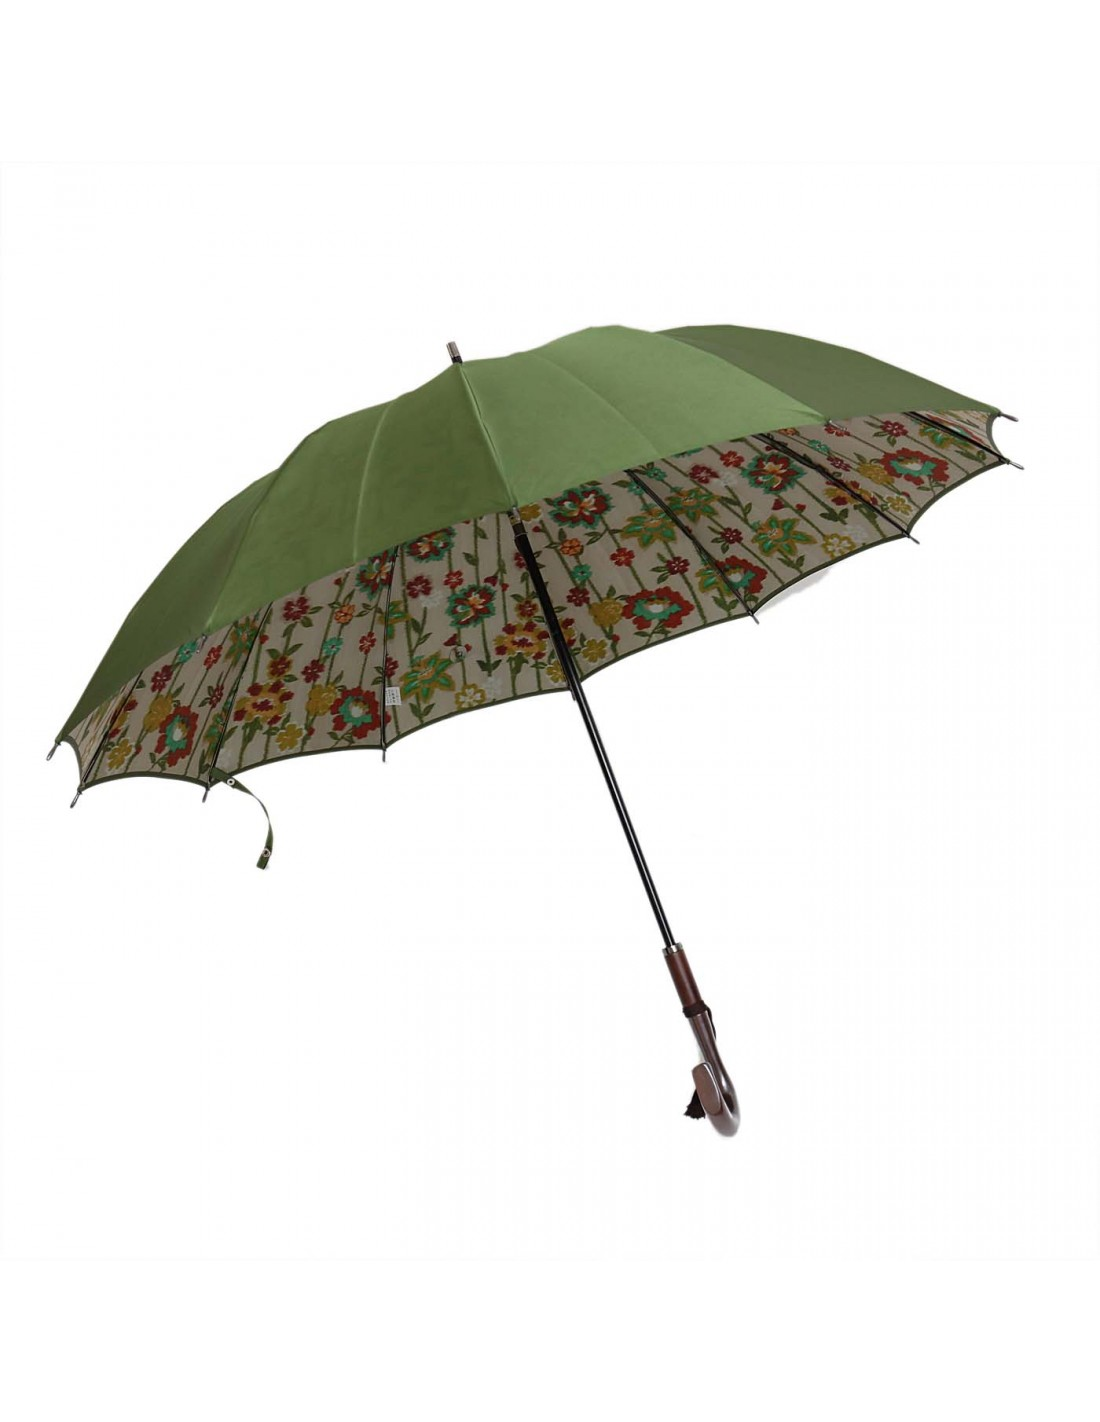 Damen Regenschirm Blumenmuster Grün